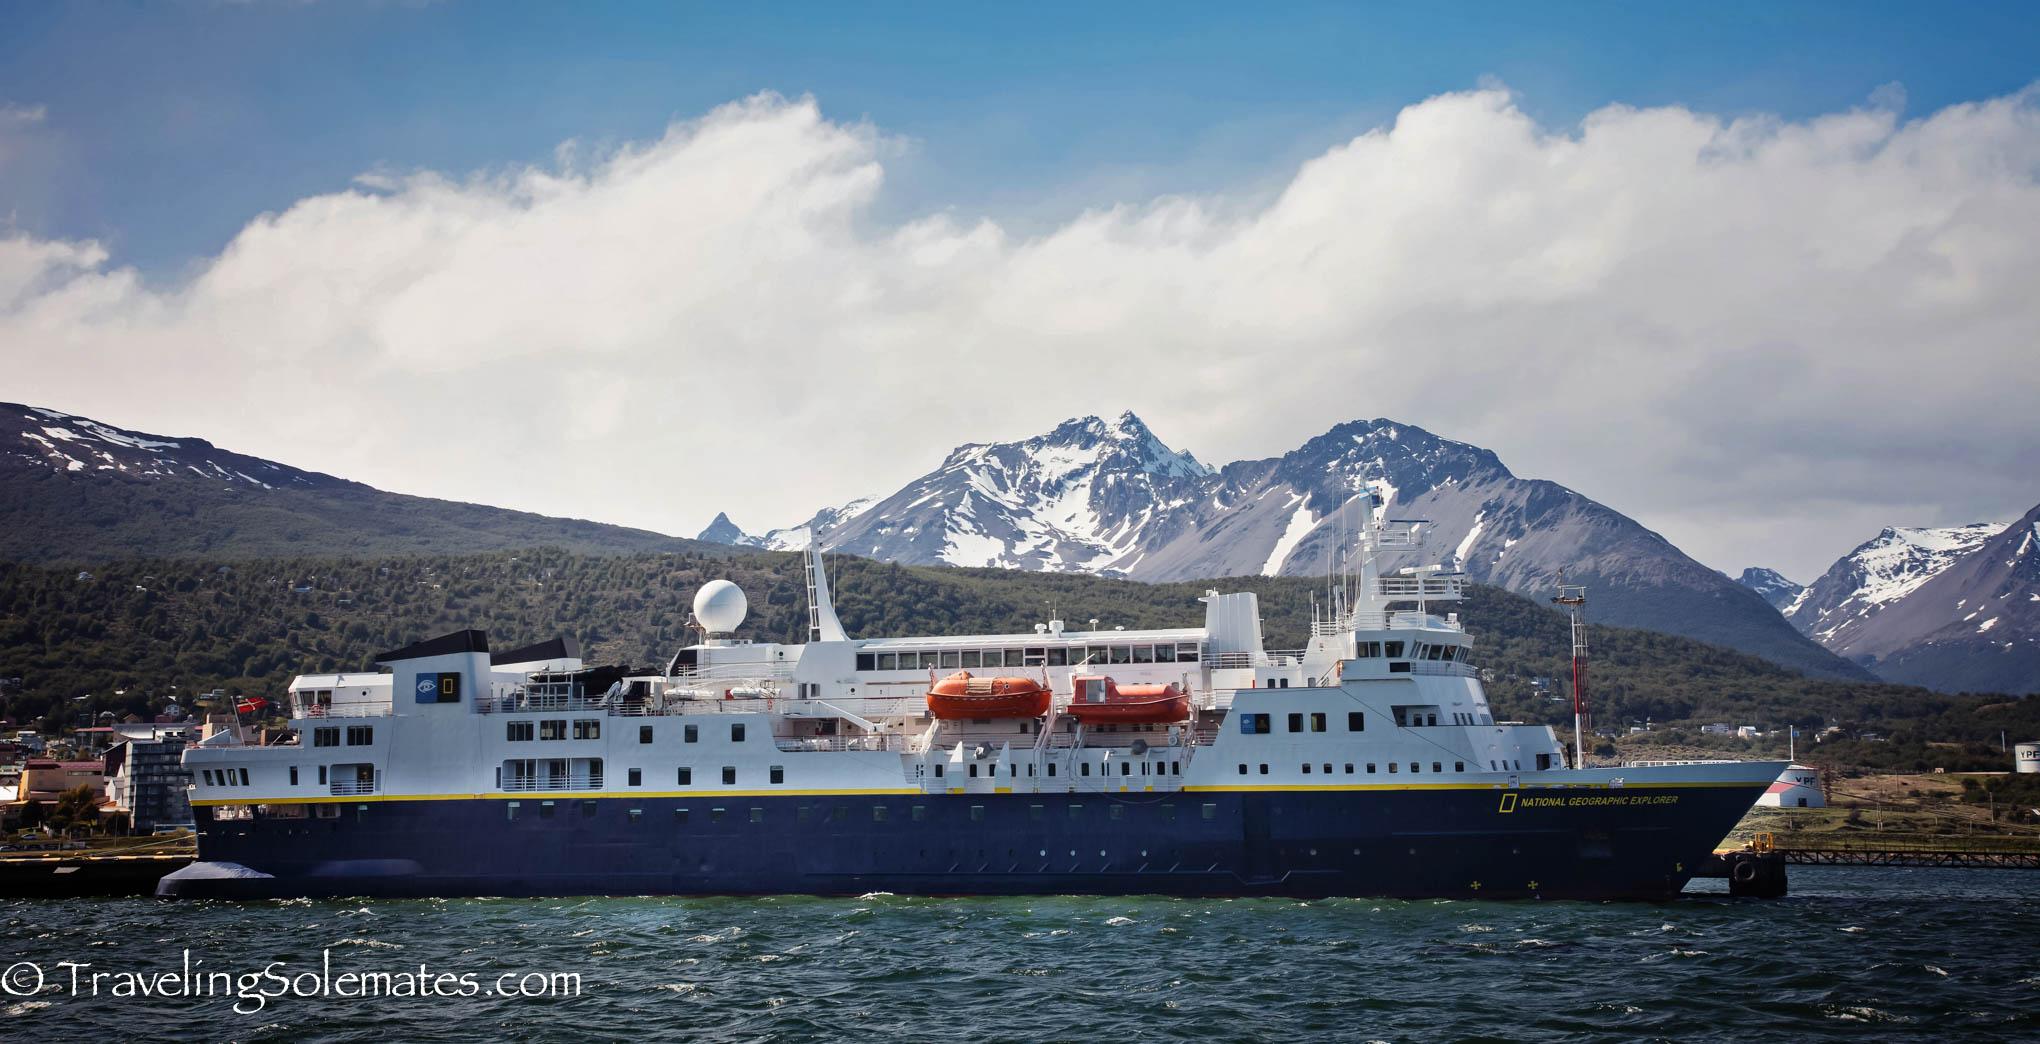 National Geographic Explorer docked in Ushuaia pier, Tierra Del Fuego, Argentina